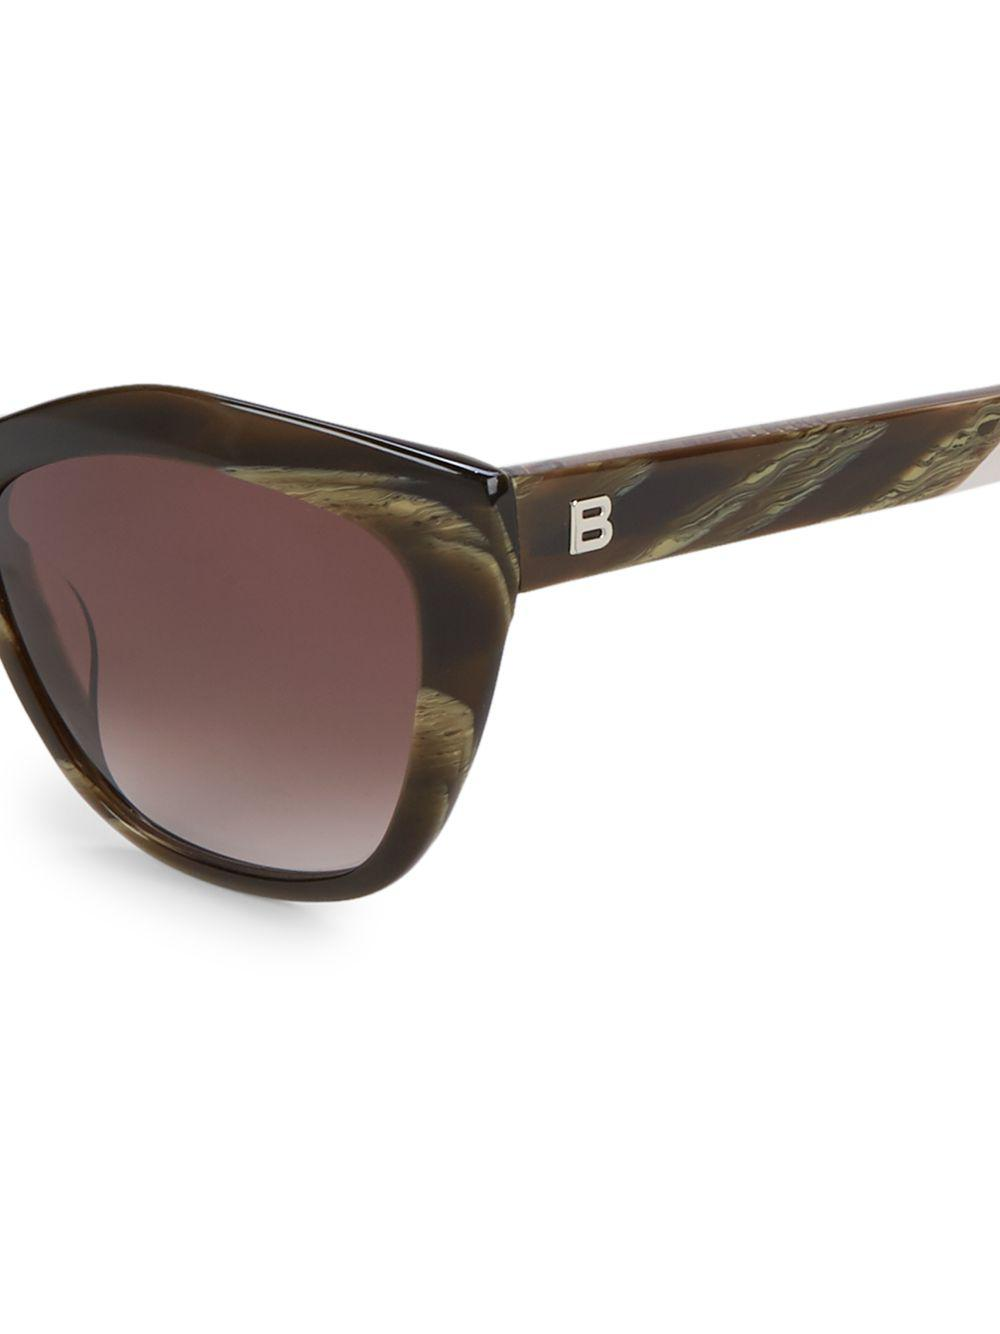 78eb15bb392 Balenciaga - Brown 56mm Square Sunglasses - Lyst. View fullscreen